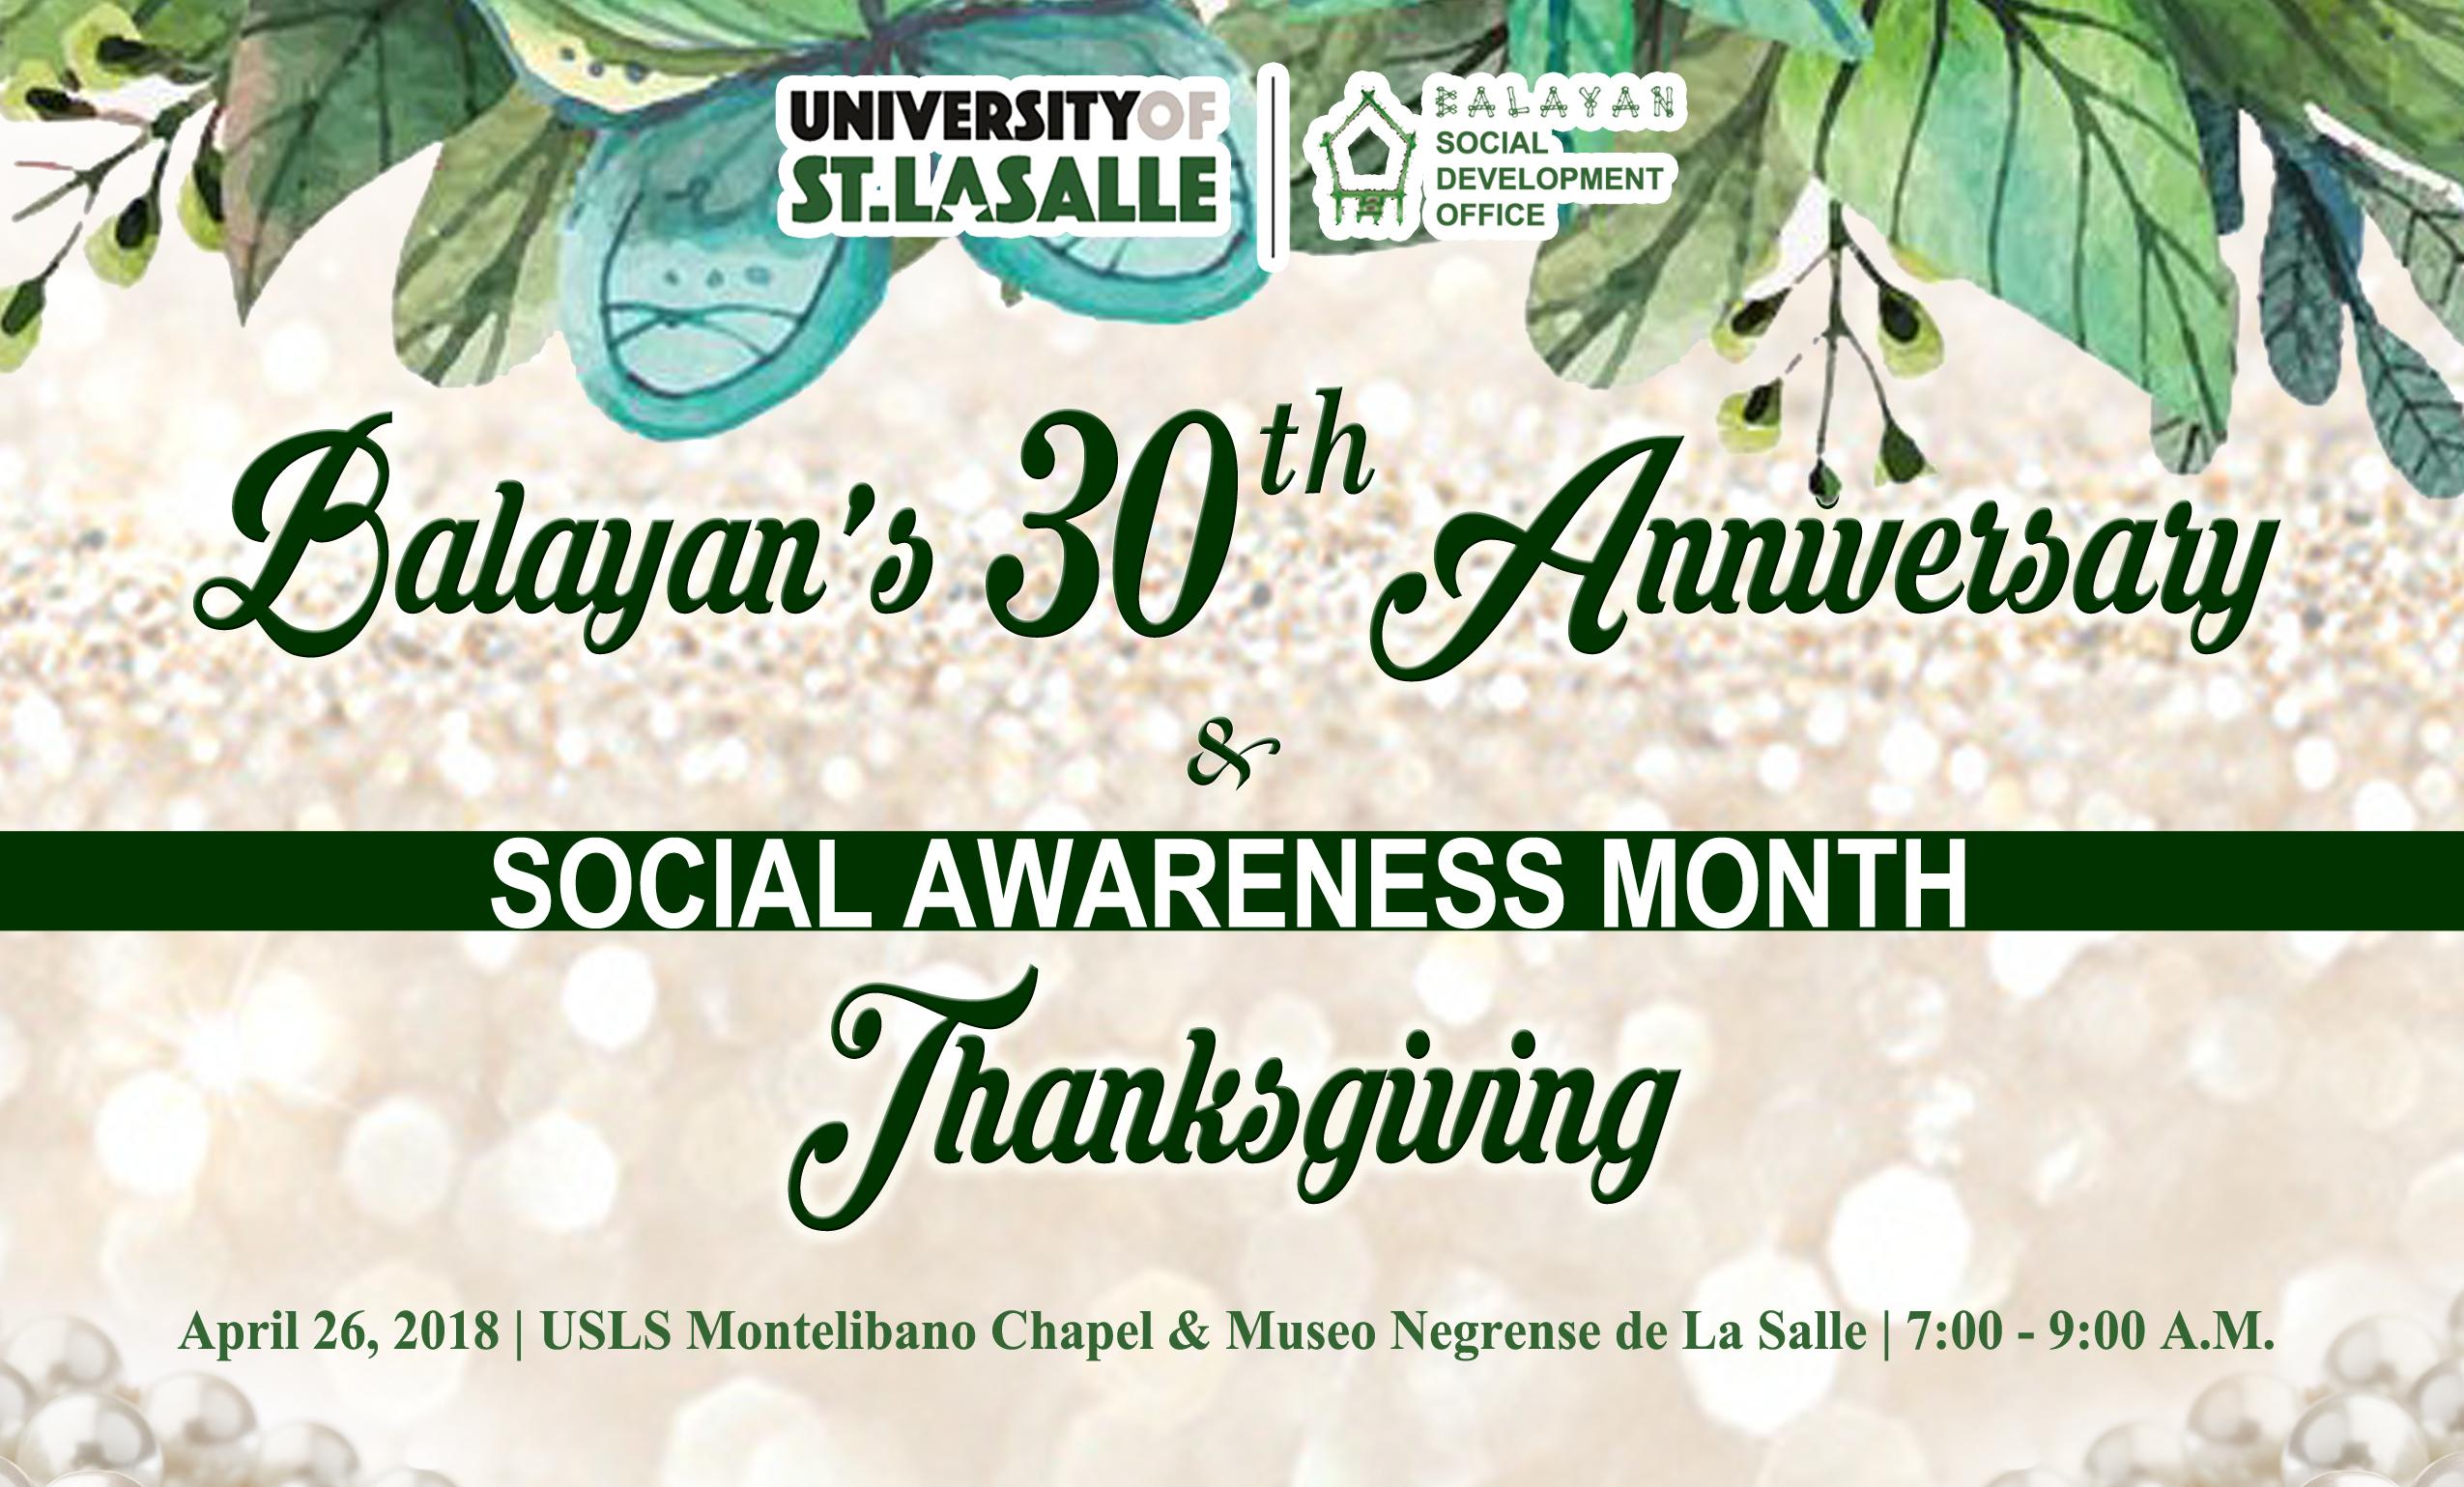 Balayans-30th-Anniversary-Social-Awareness-Month-Thanksgiving.jpg